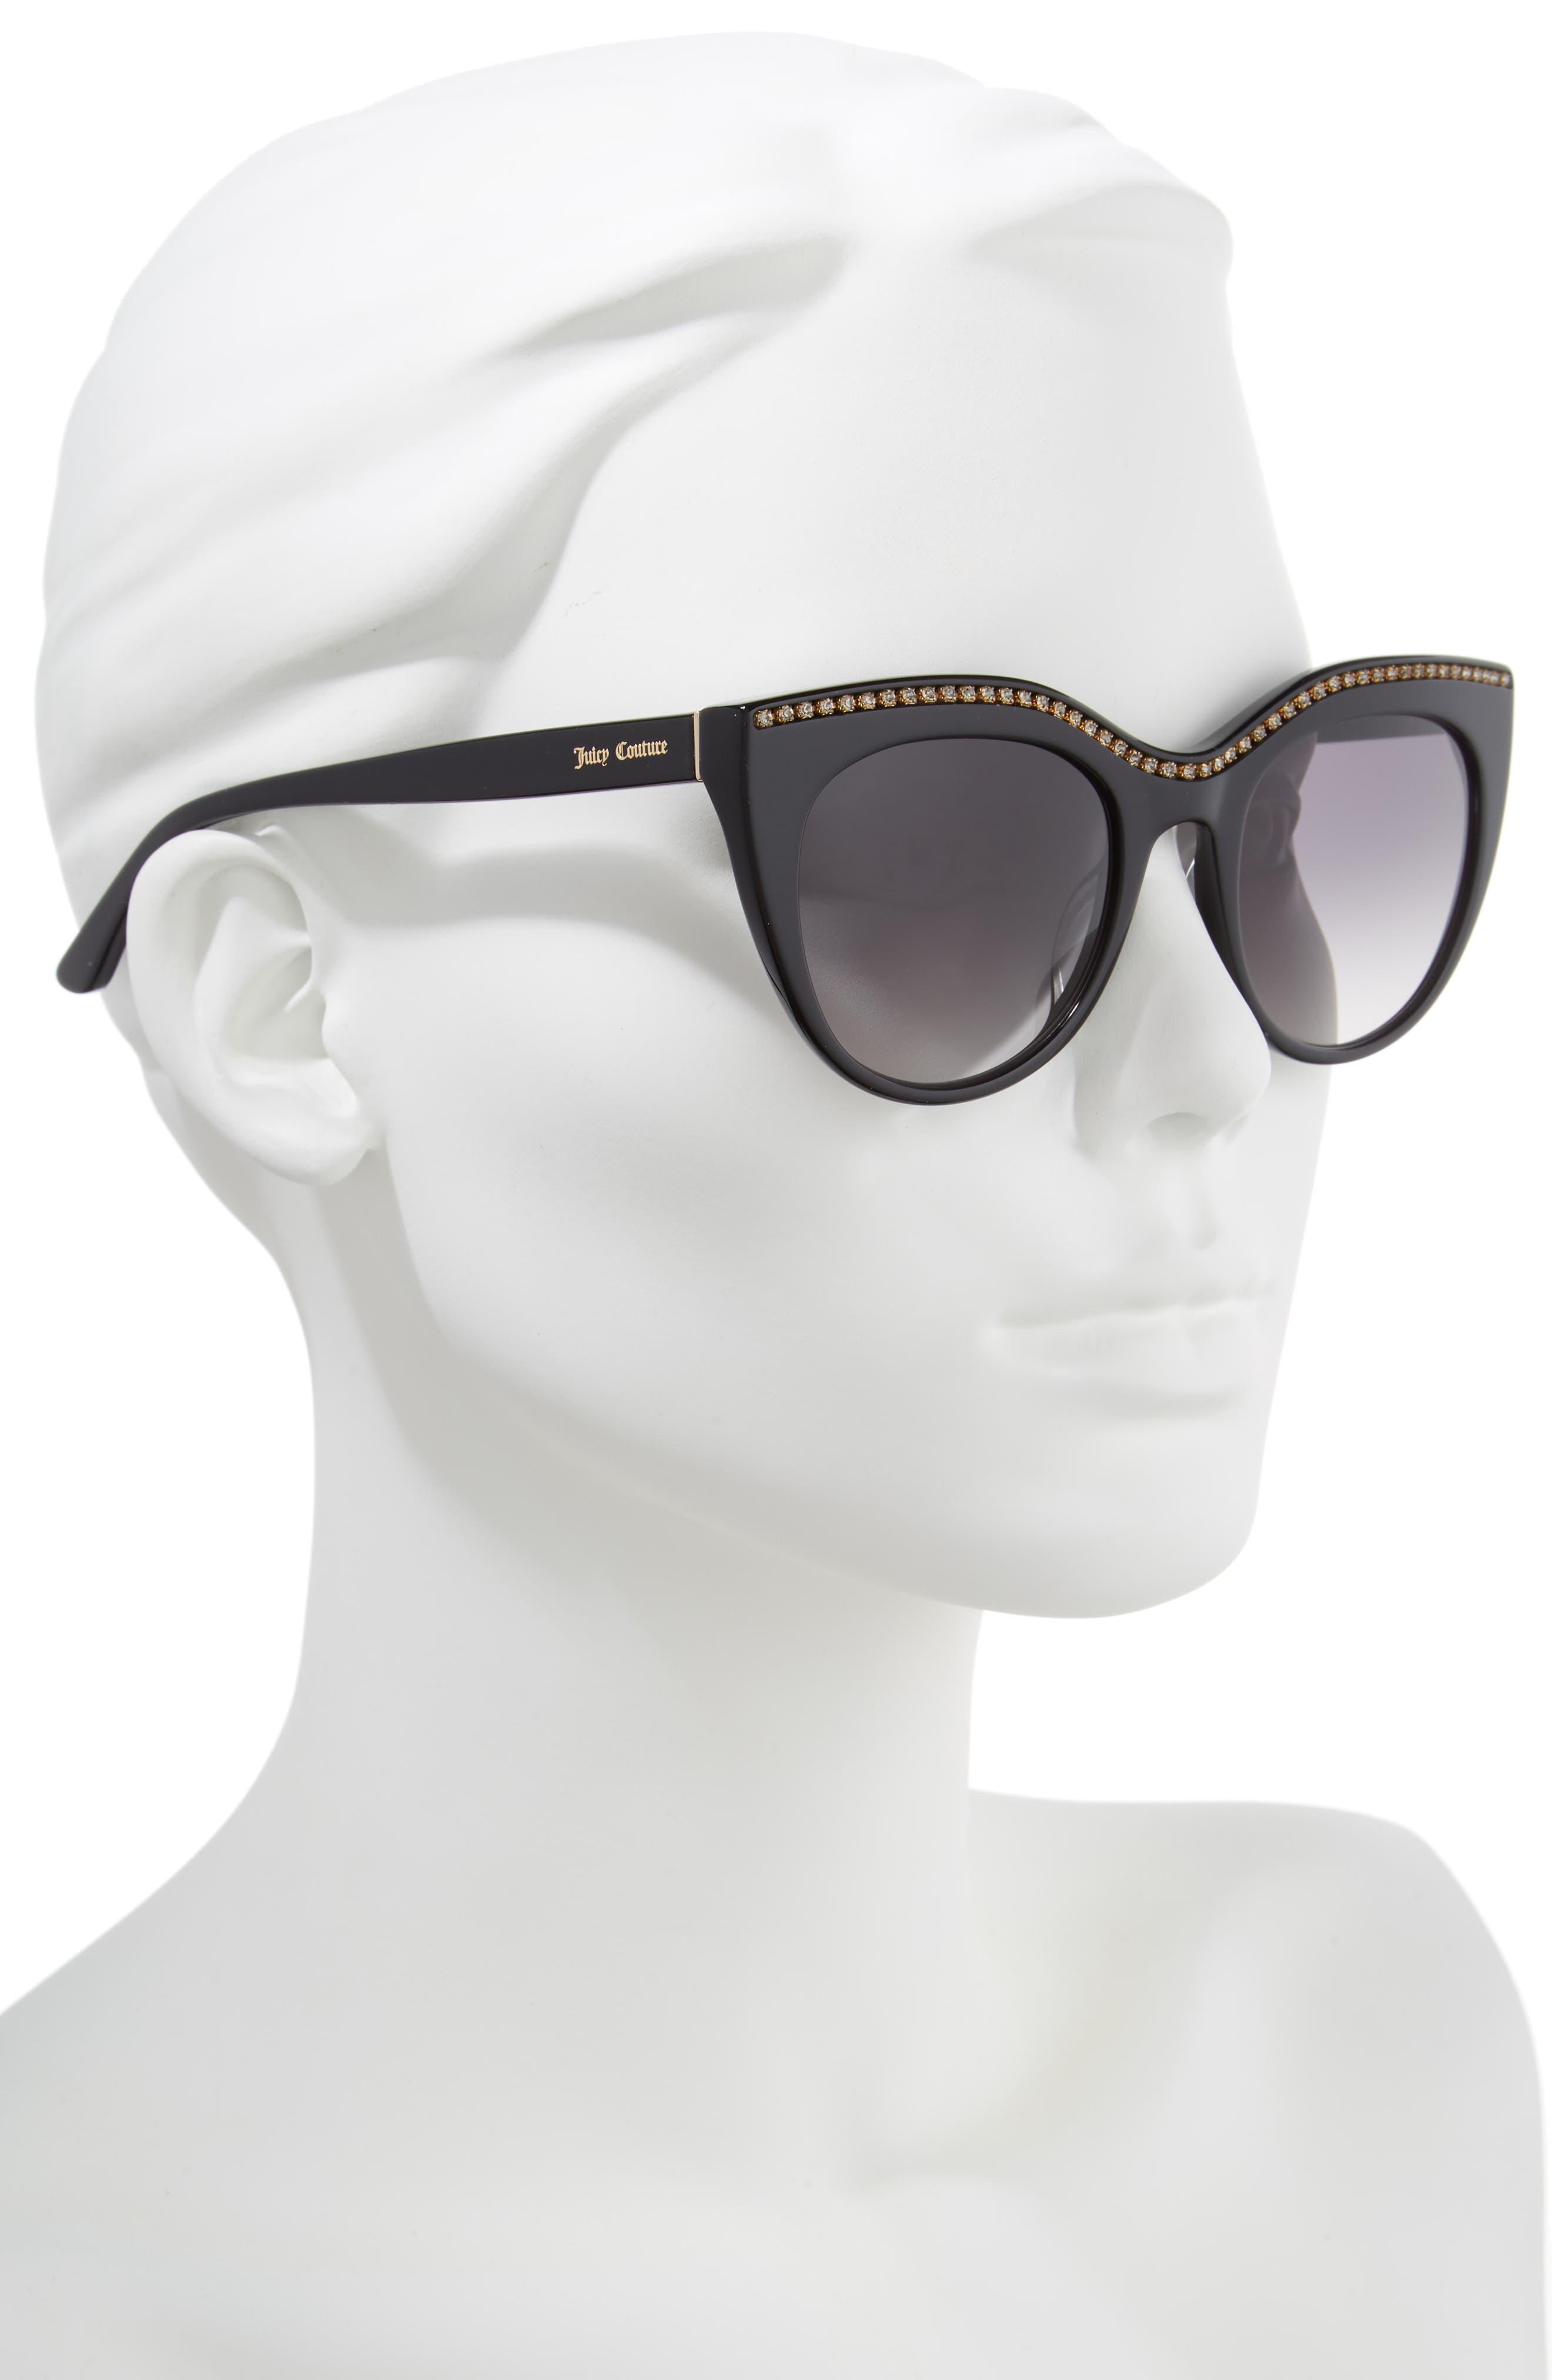 1bdb5552 Juicy Couture | Nordstrom